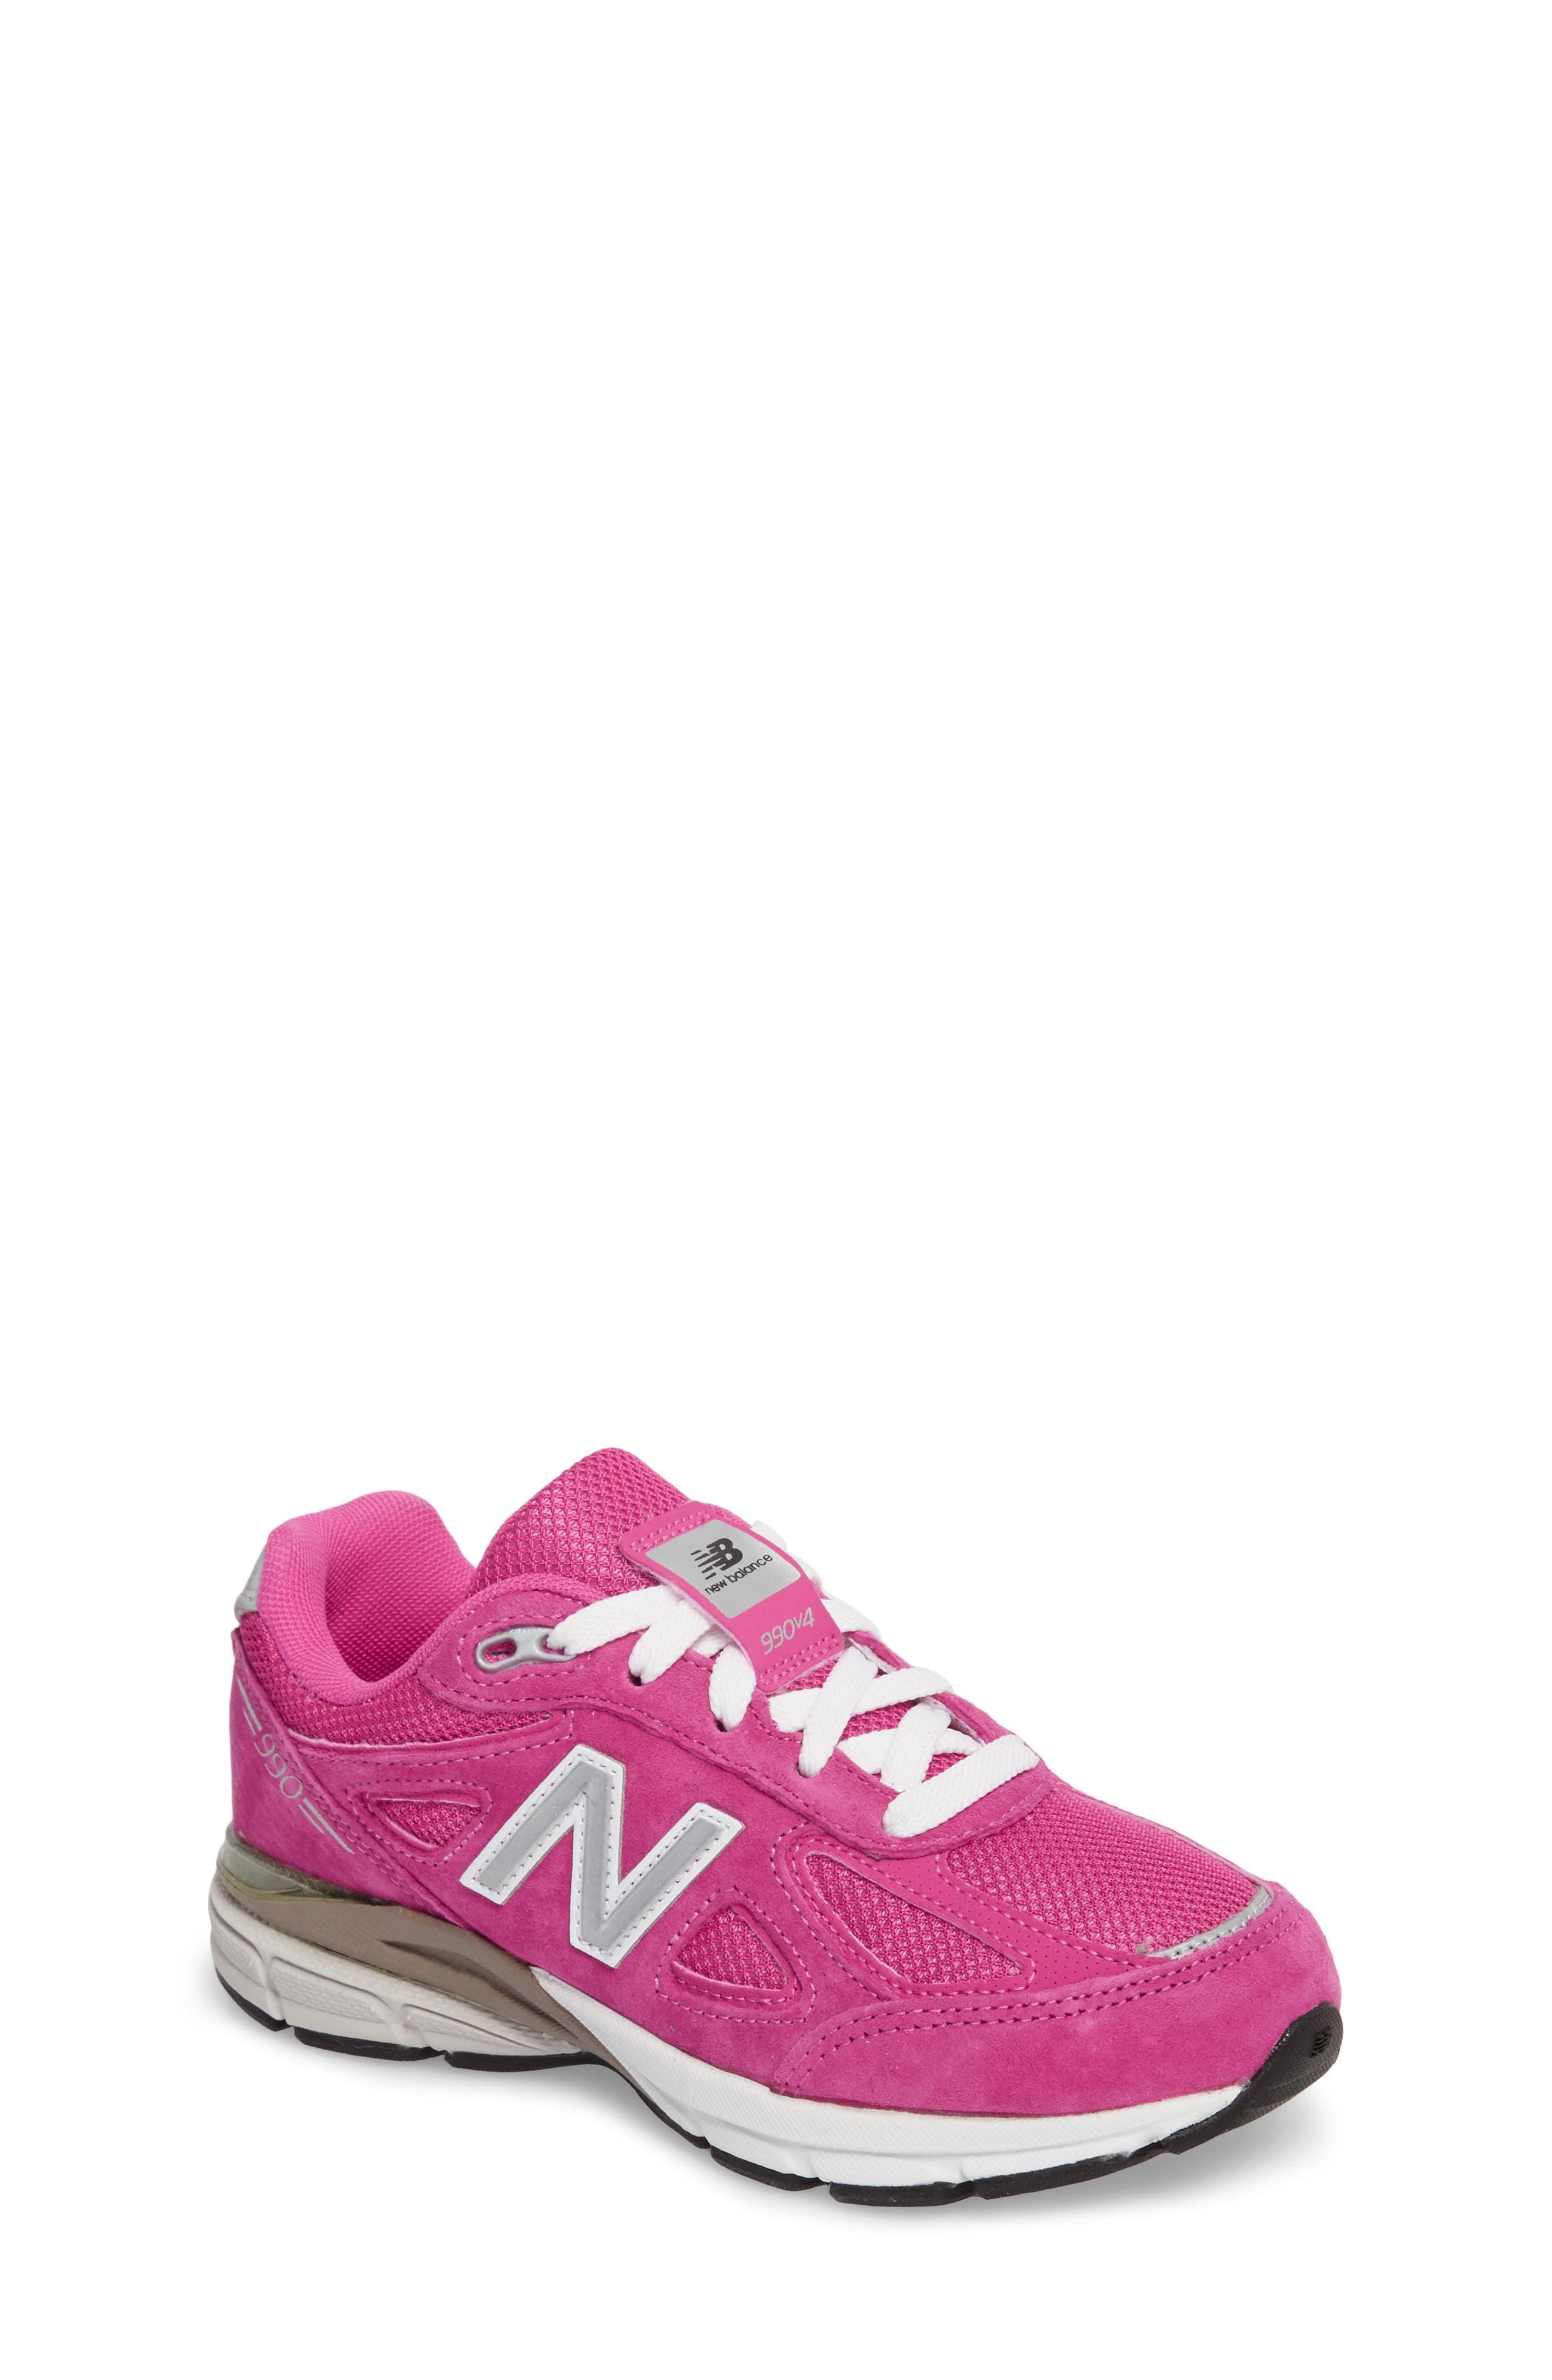 990v4 Sneaker,                             Main thumbnail 1, color,                             660